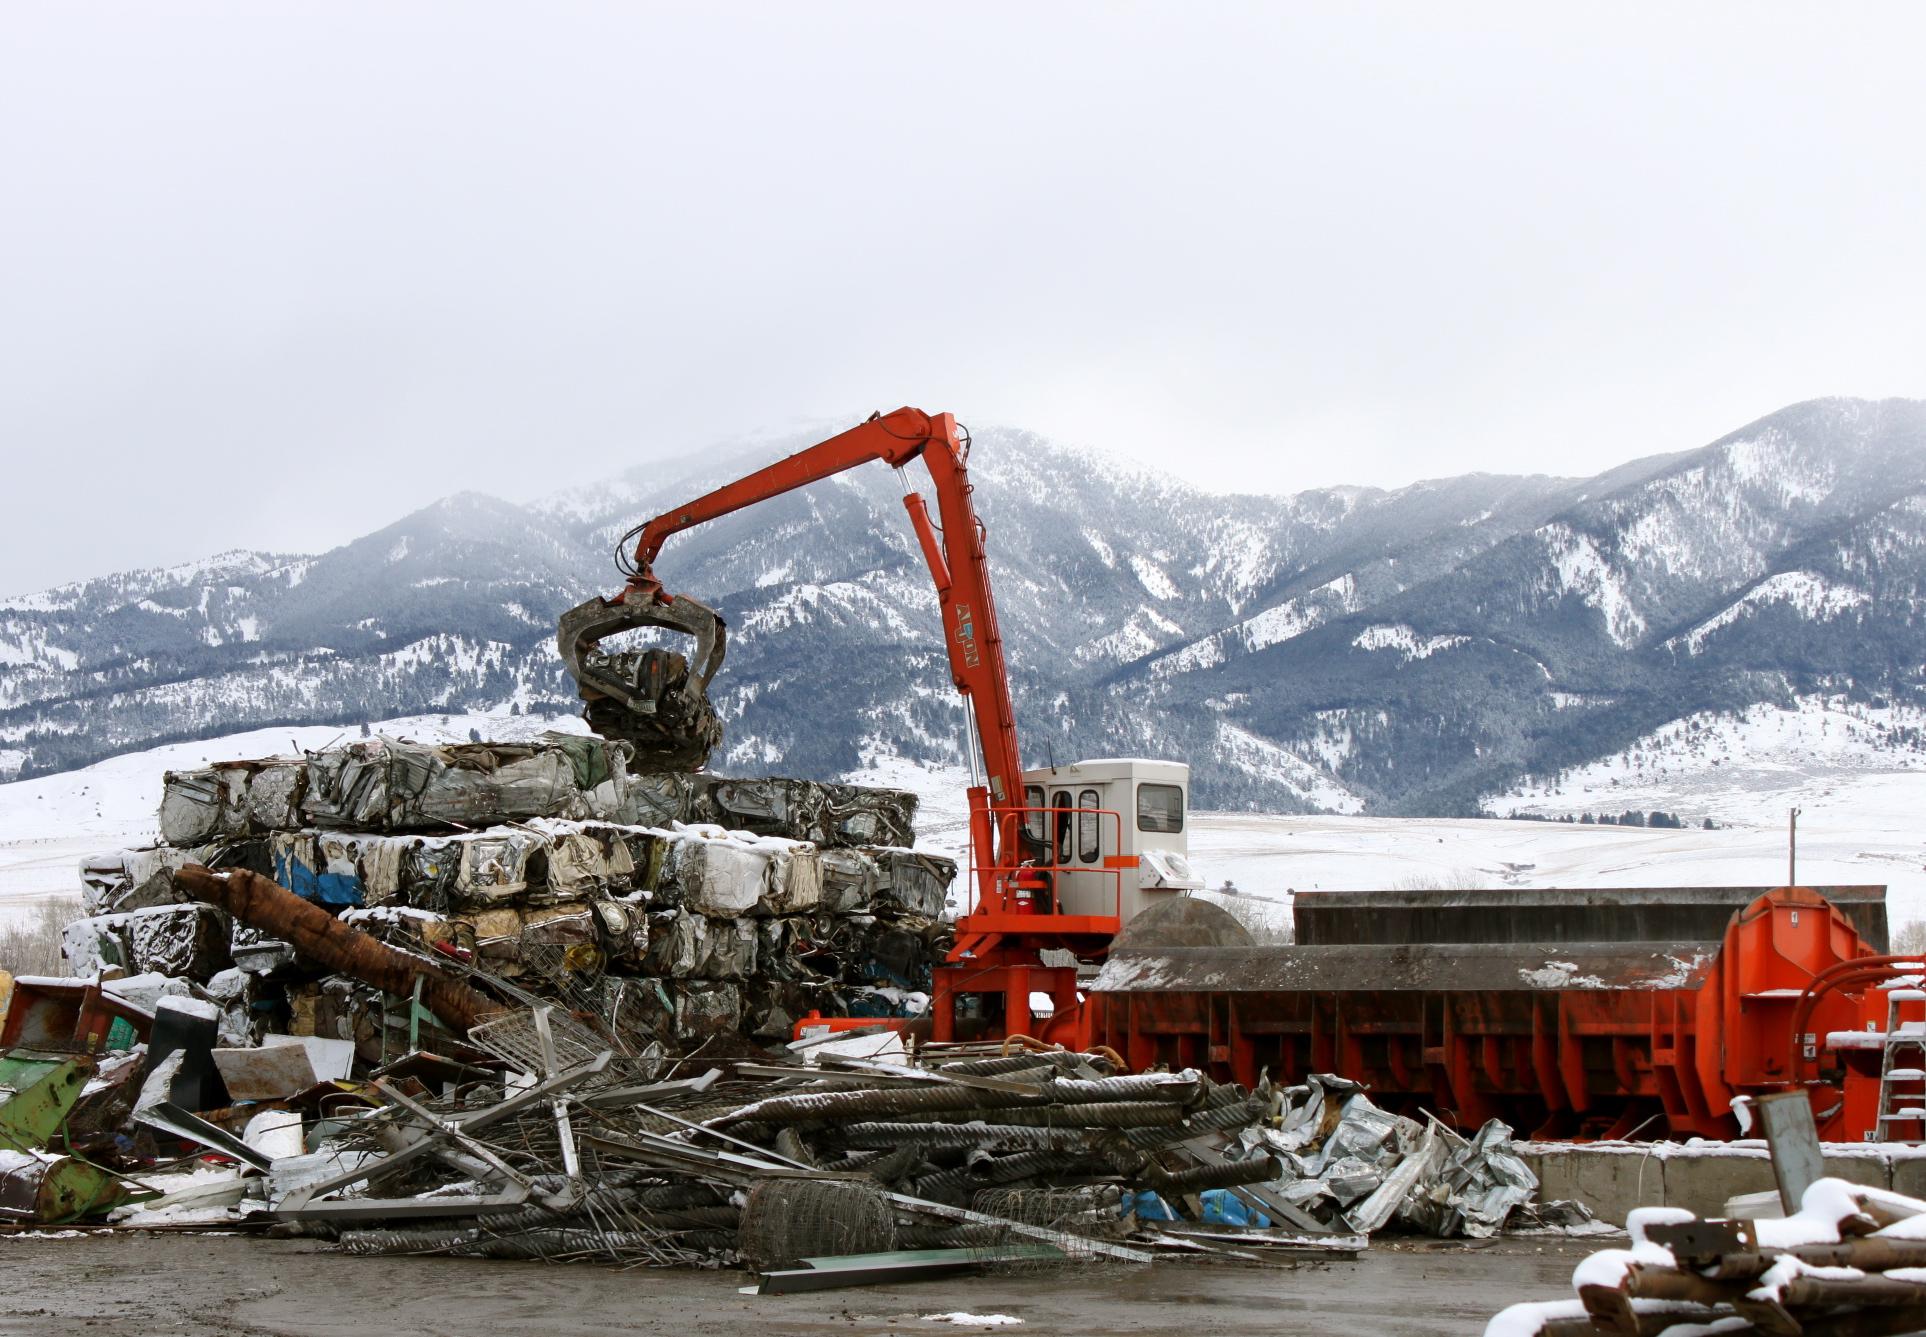 car recycling area in recycling scrap yard